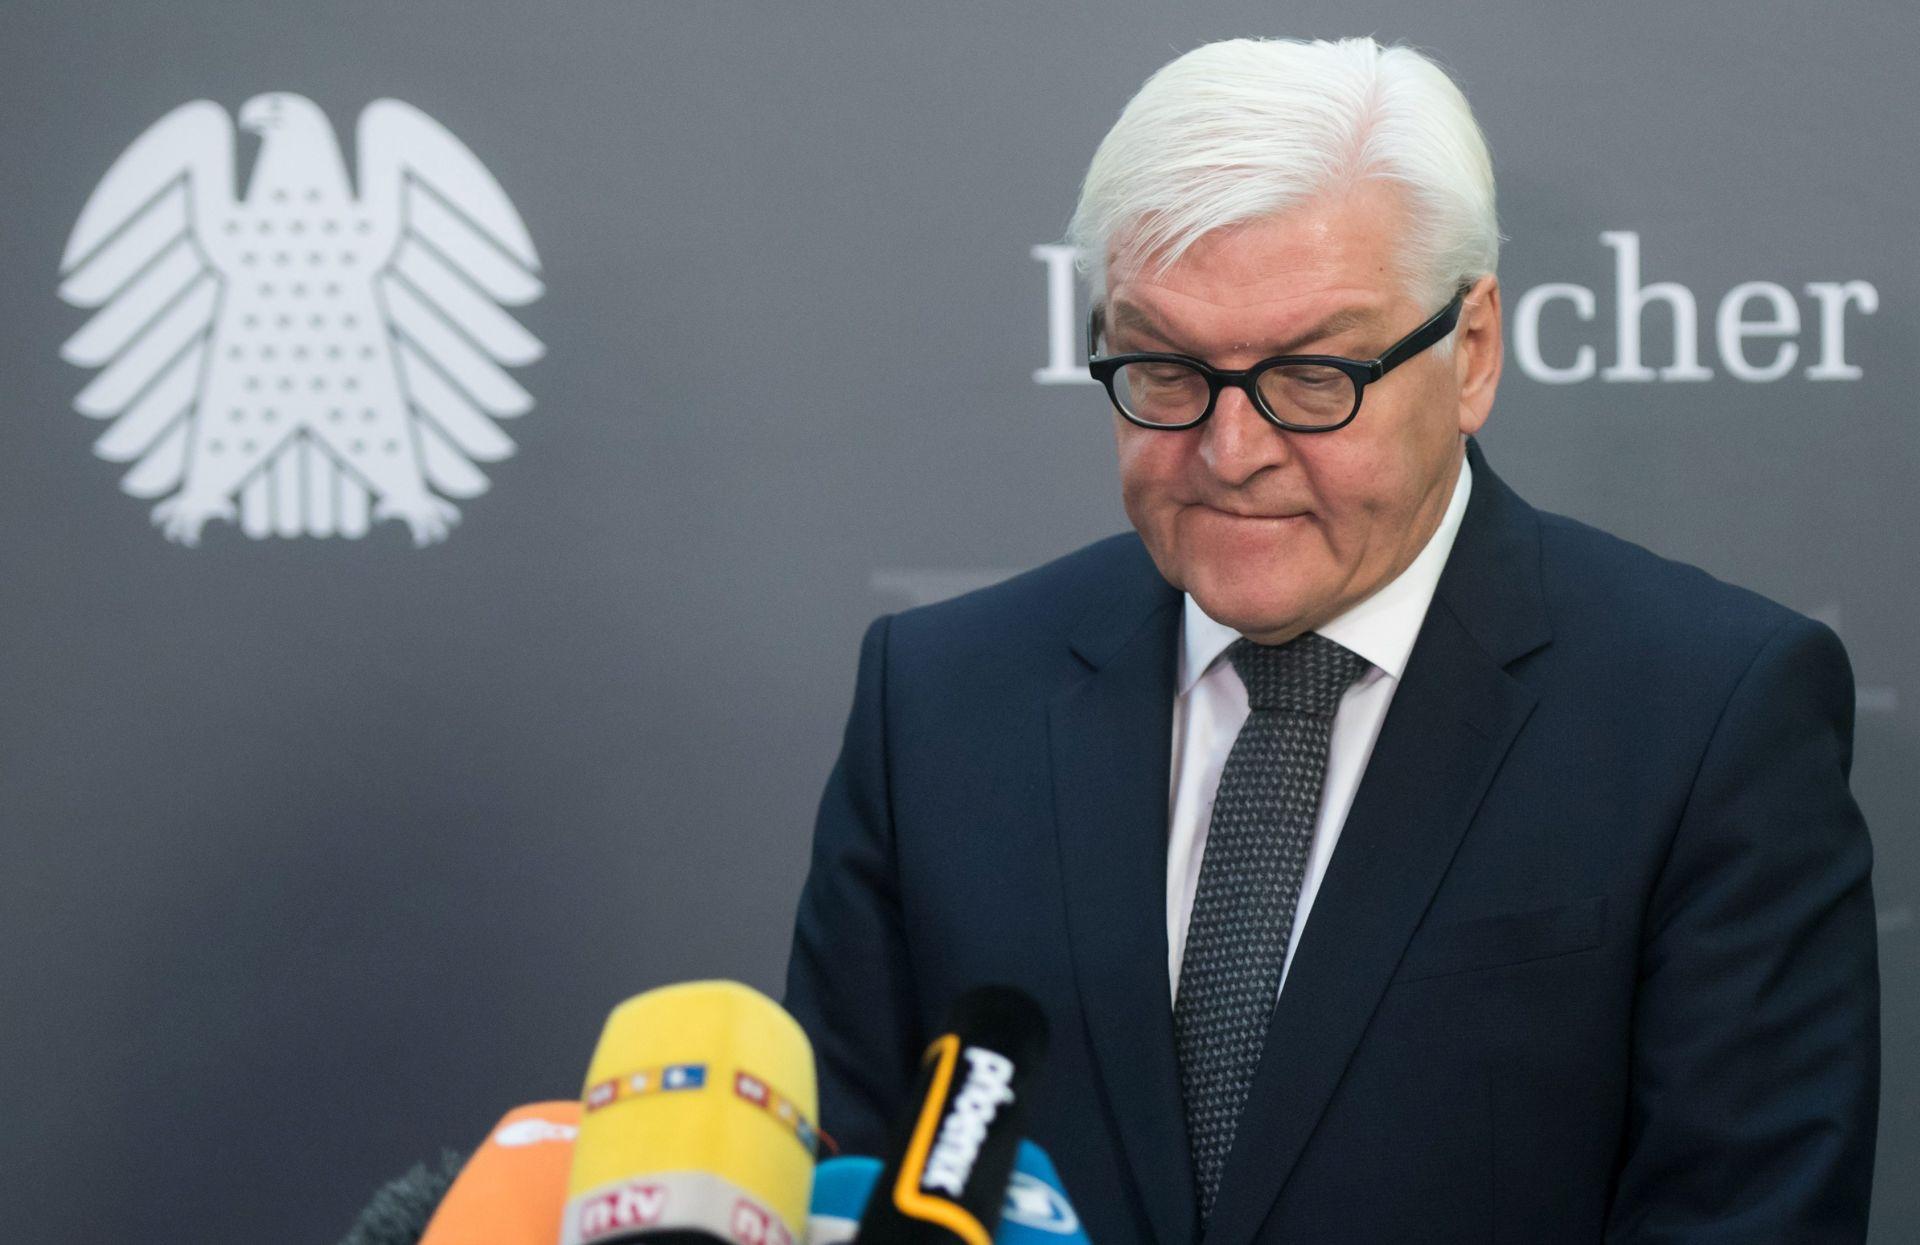 Frank-Walter Steinmeier budući njemački predsjednik